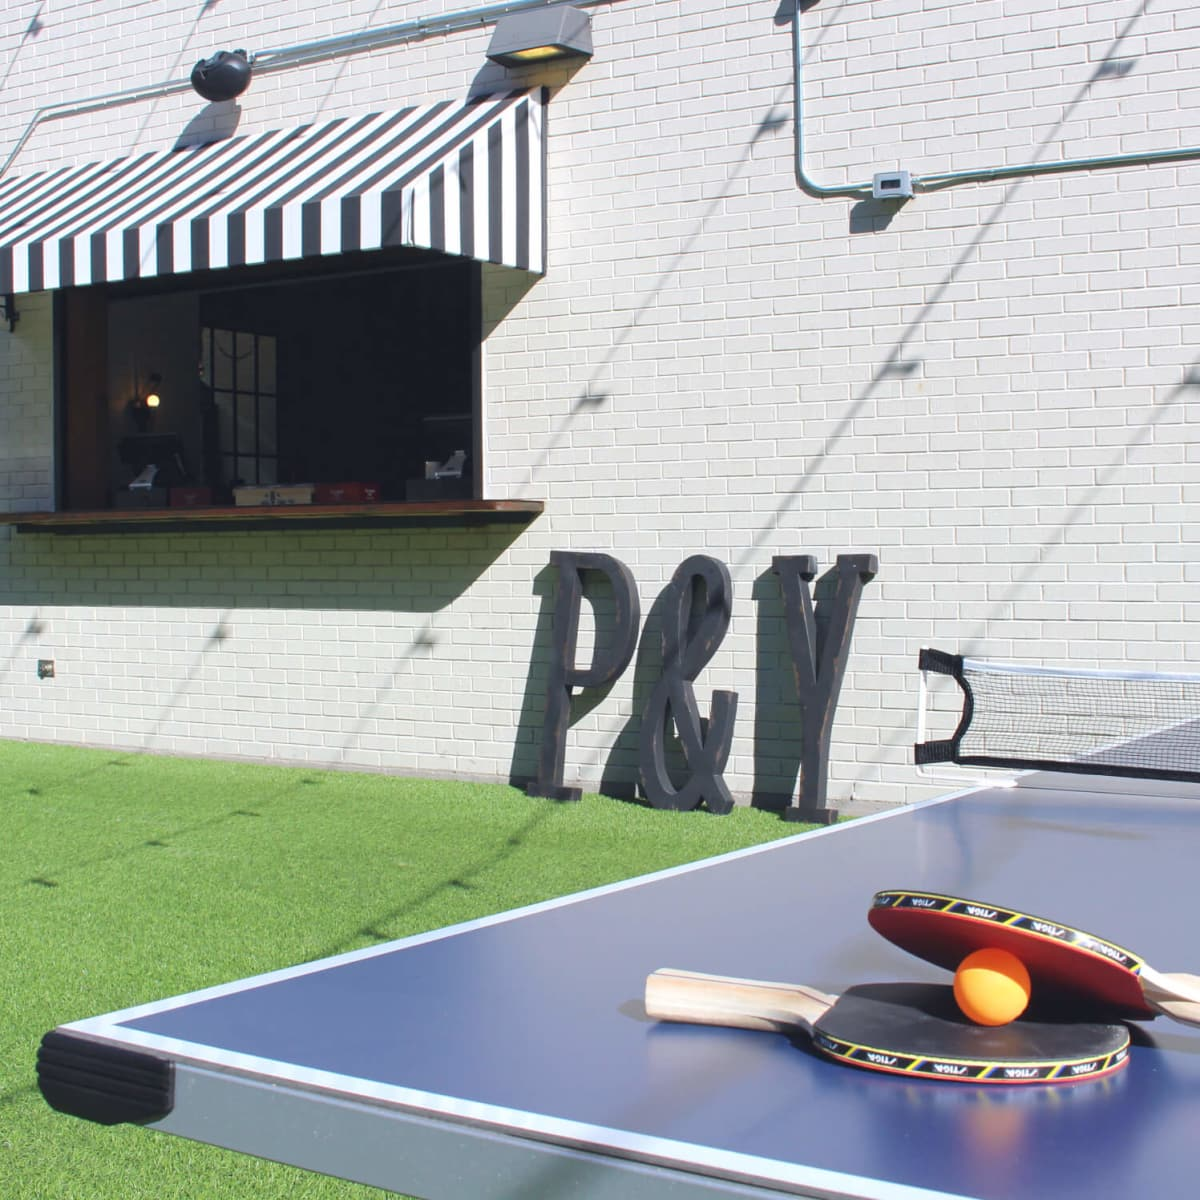 Parlor & Yard bar Dunlap ATX west sixth February 2016 outdoor patio bar ping pong table